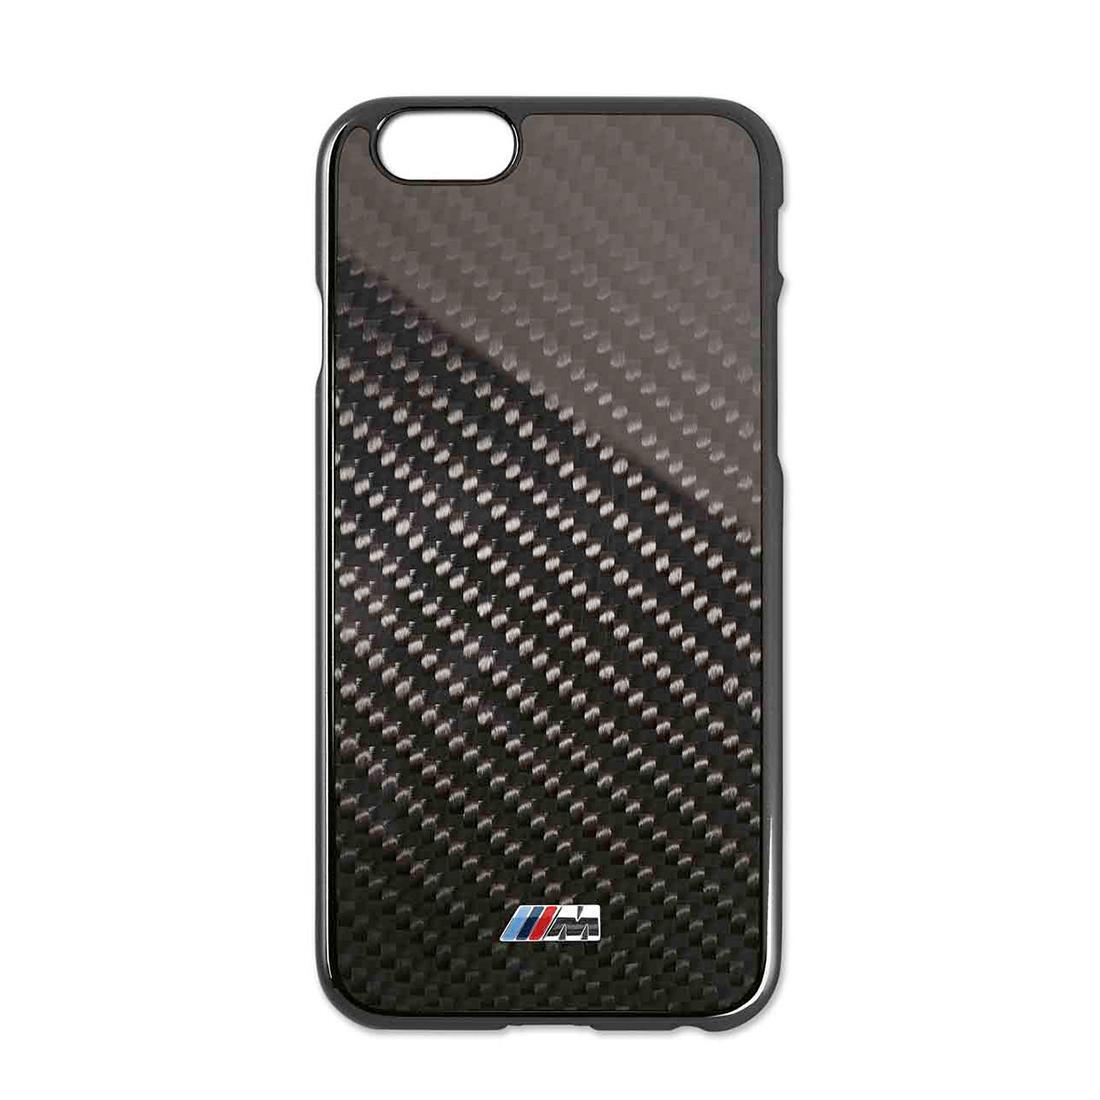 lowest price 6f668 bd819 ShopBMWUSA.com: BMW M HARD CASE CARBON IPHONE 7/8